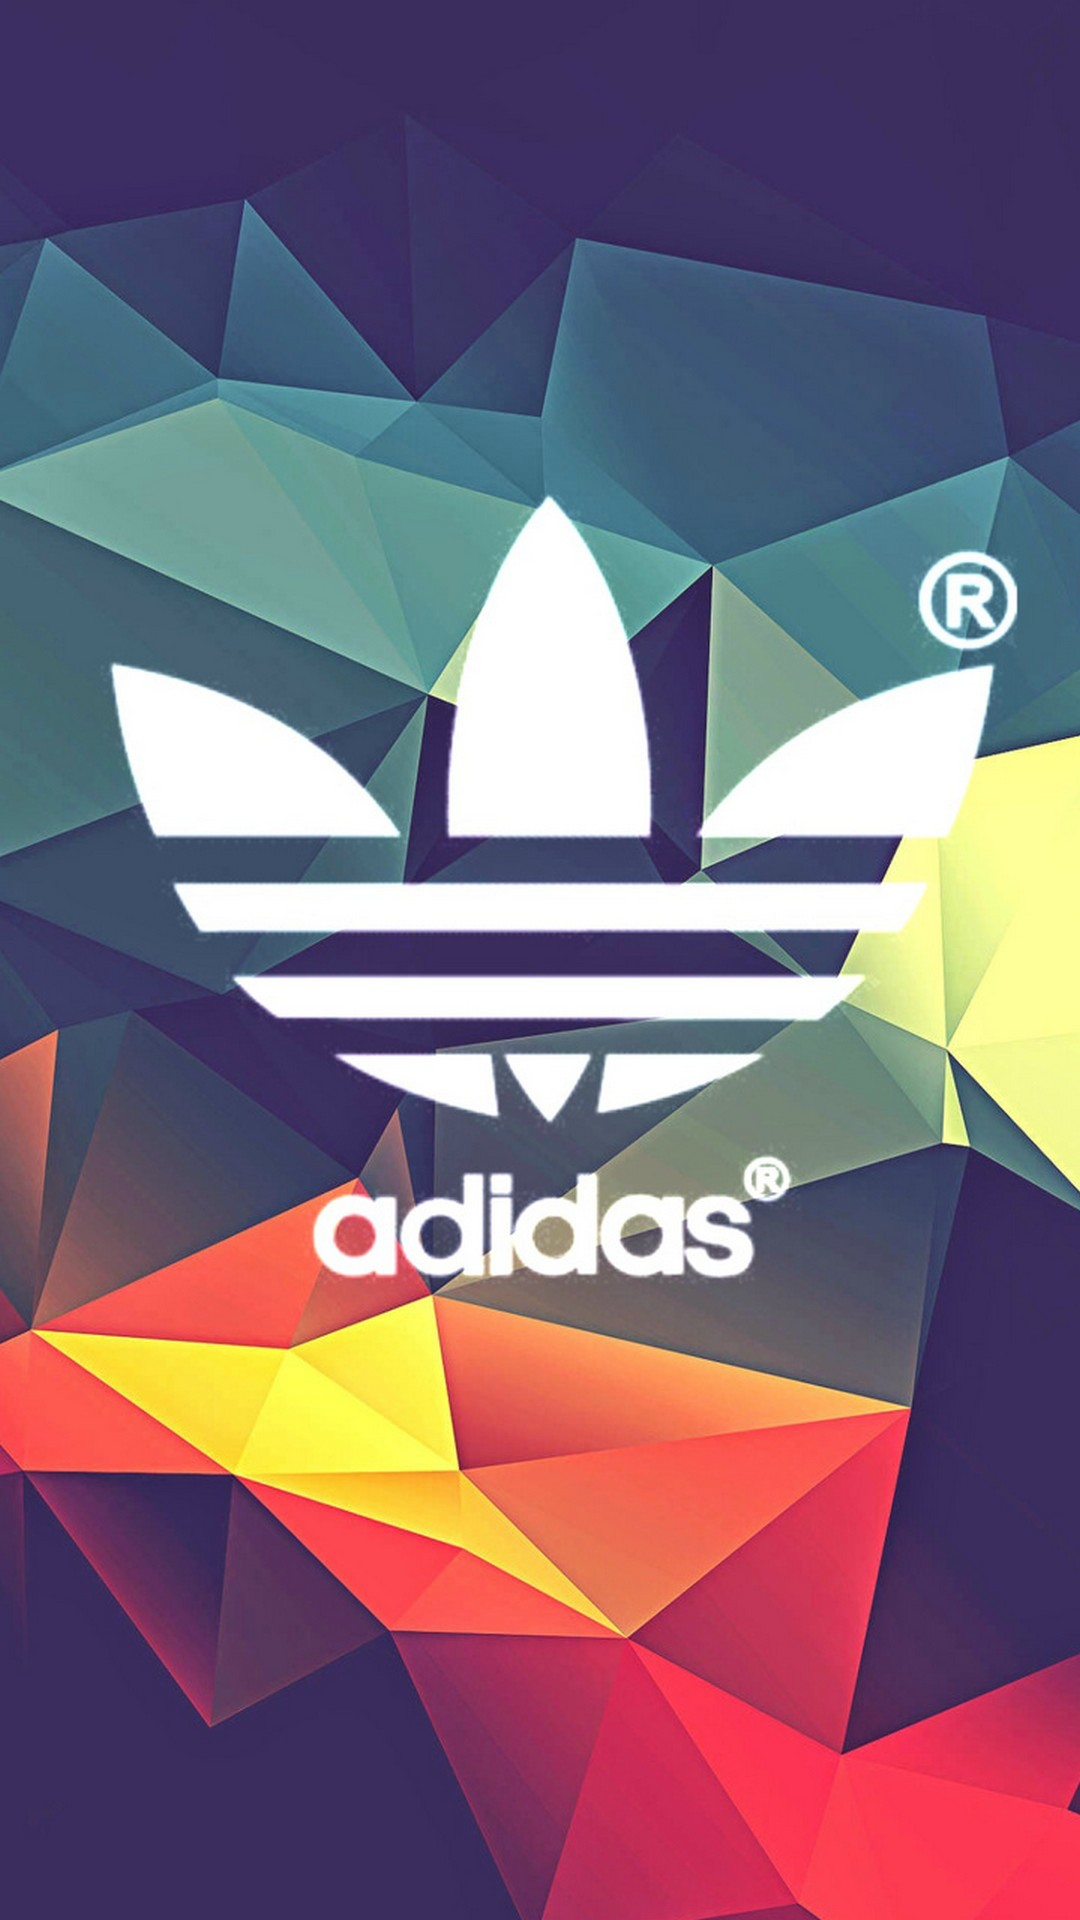 Wallpaper Adidas Android